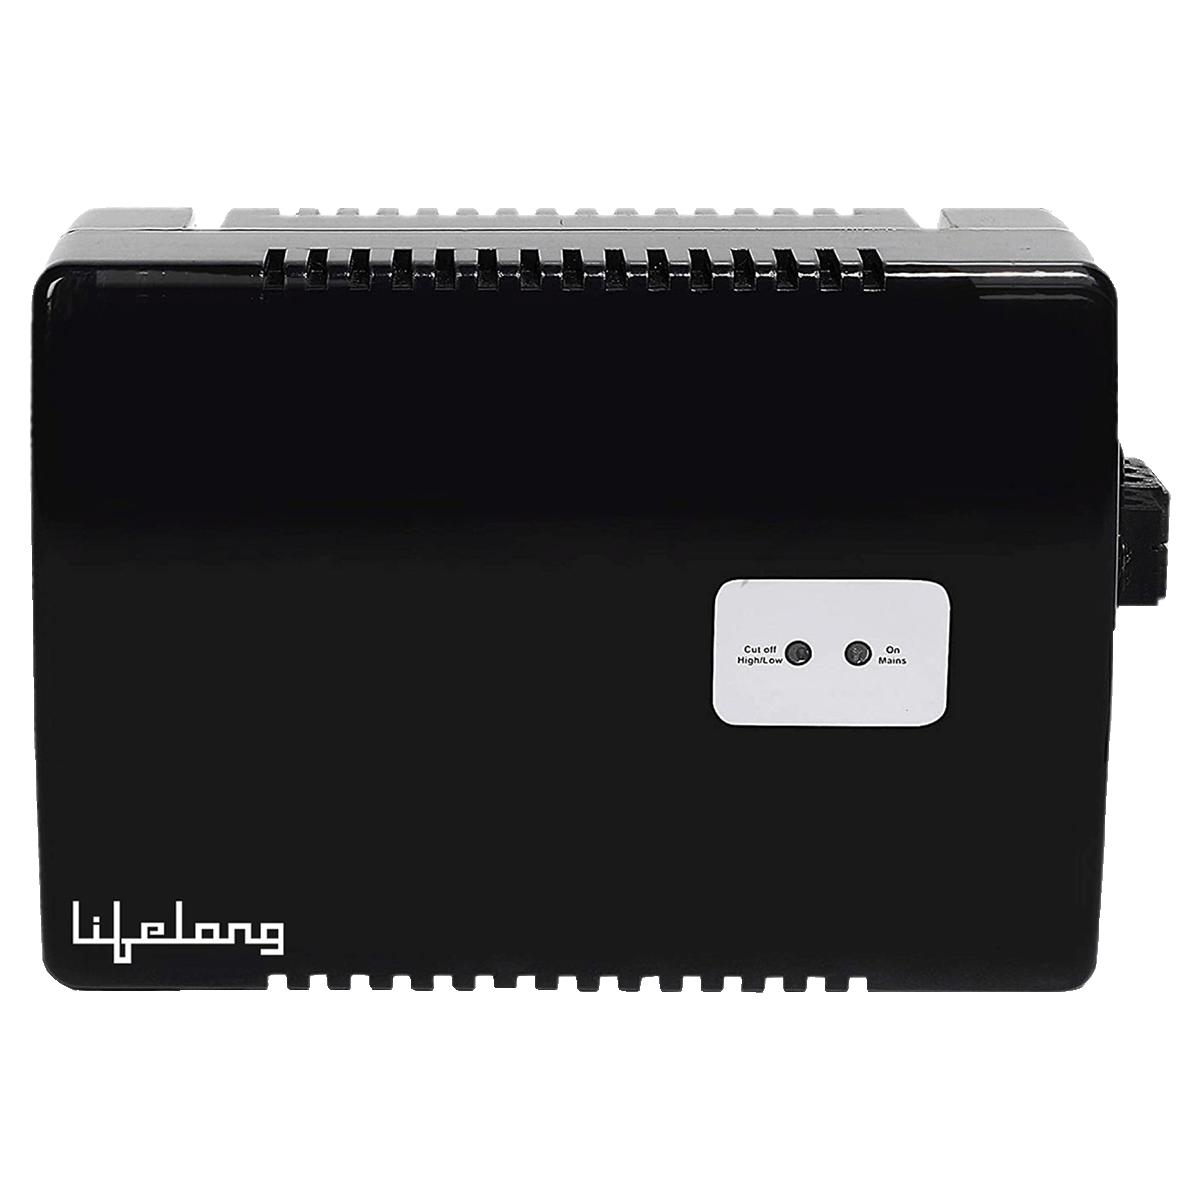 Lifelong 170-270V Air Conditioner Voltage Stabilizer for up to 1.5 Ton (LLVST300, Black)_1